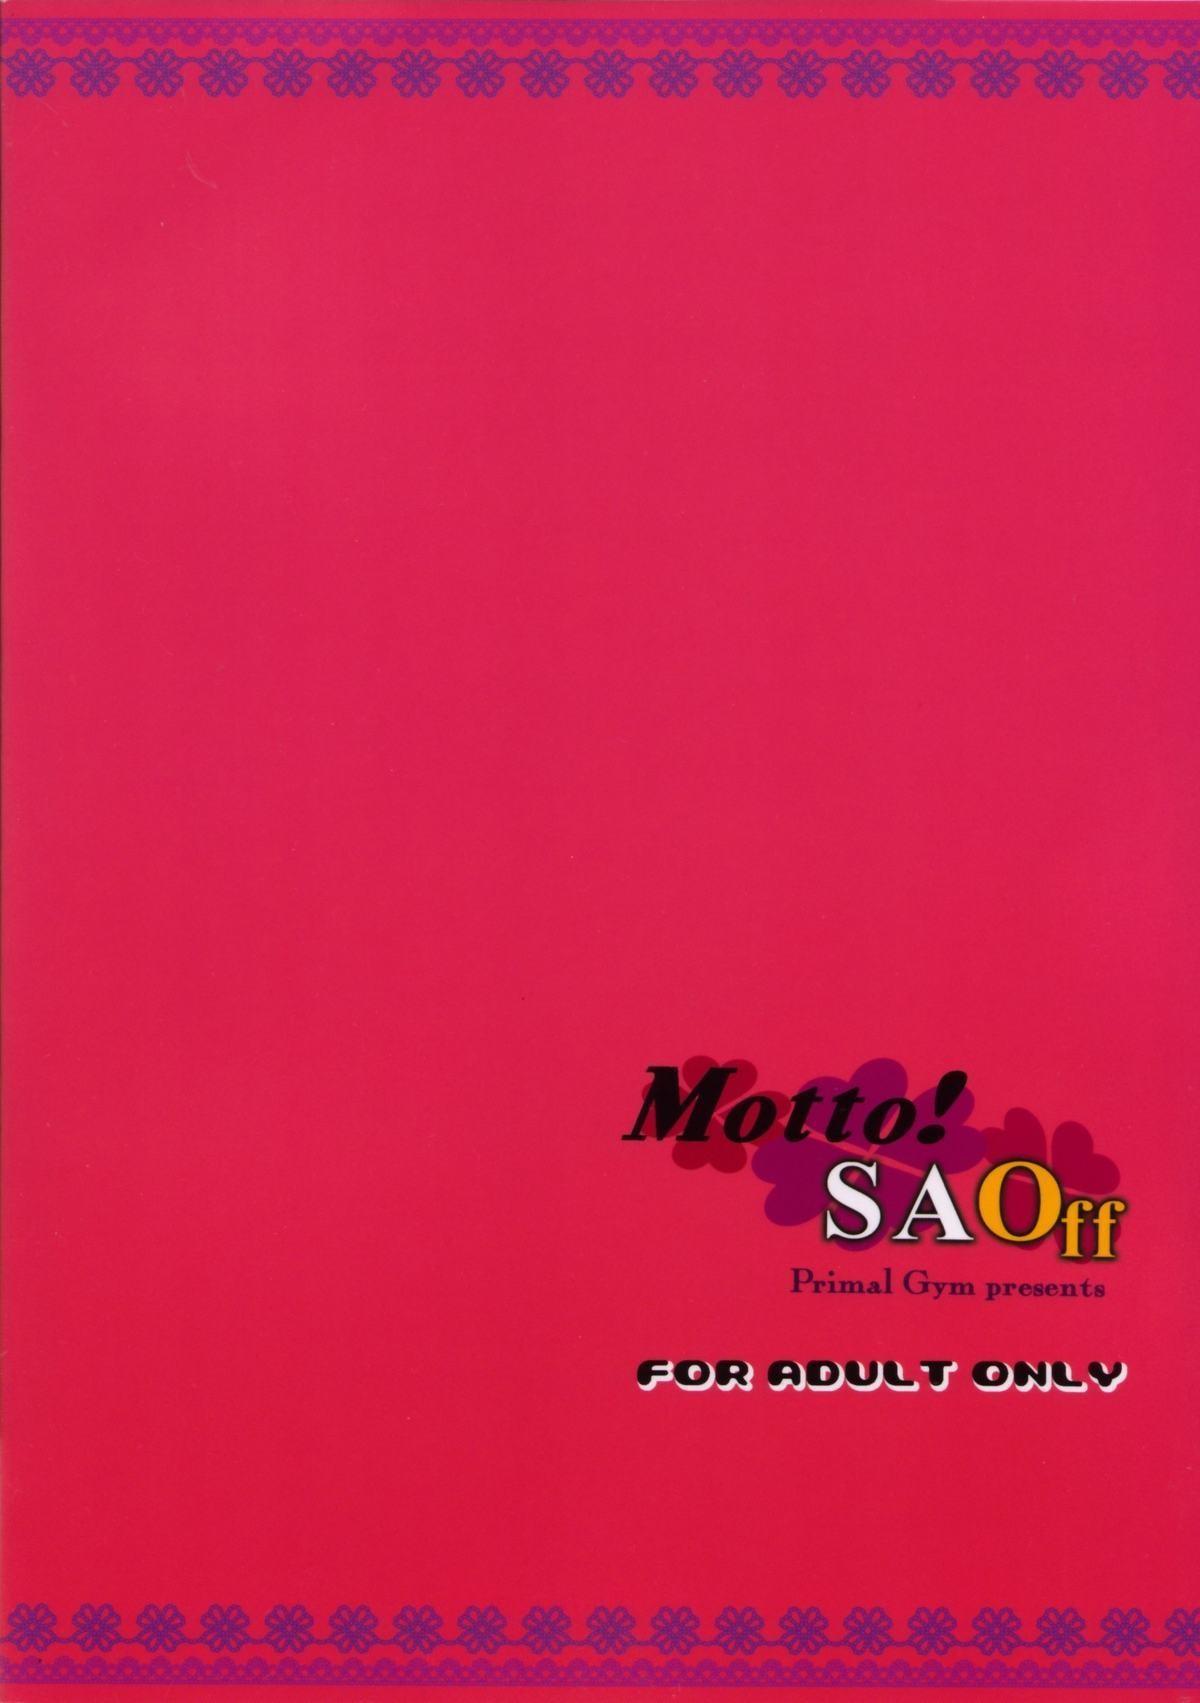 Motto Saoff 18